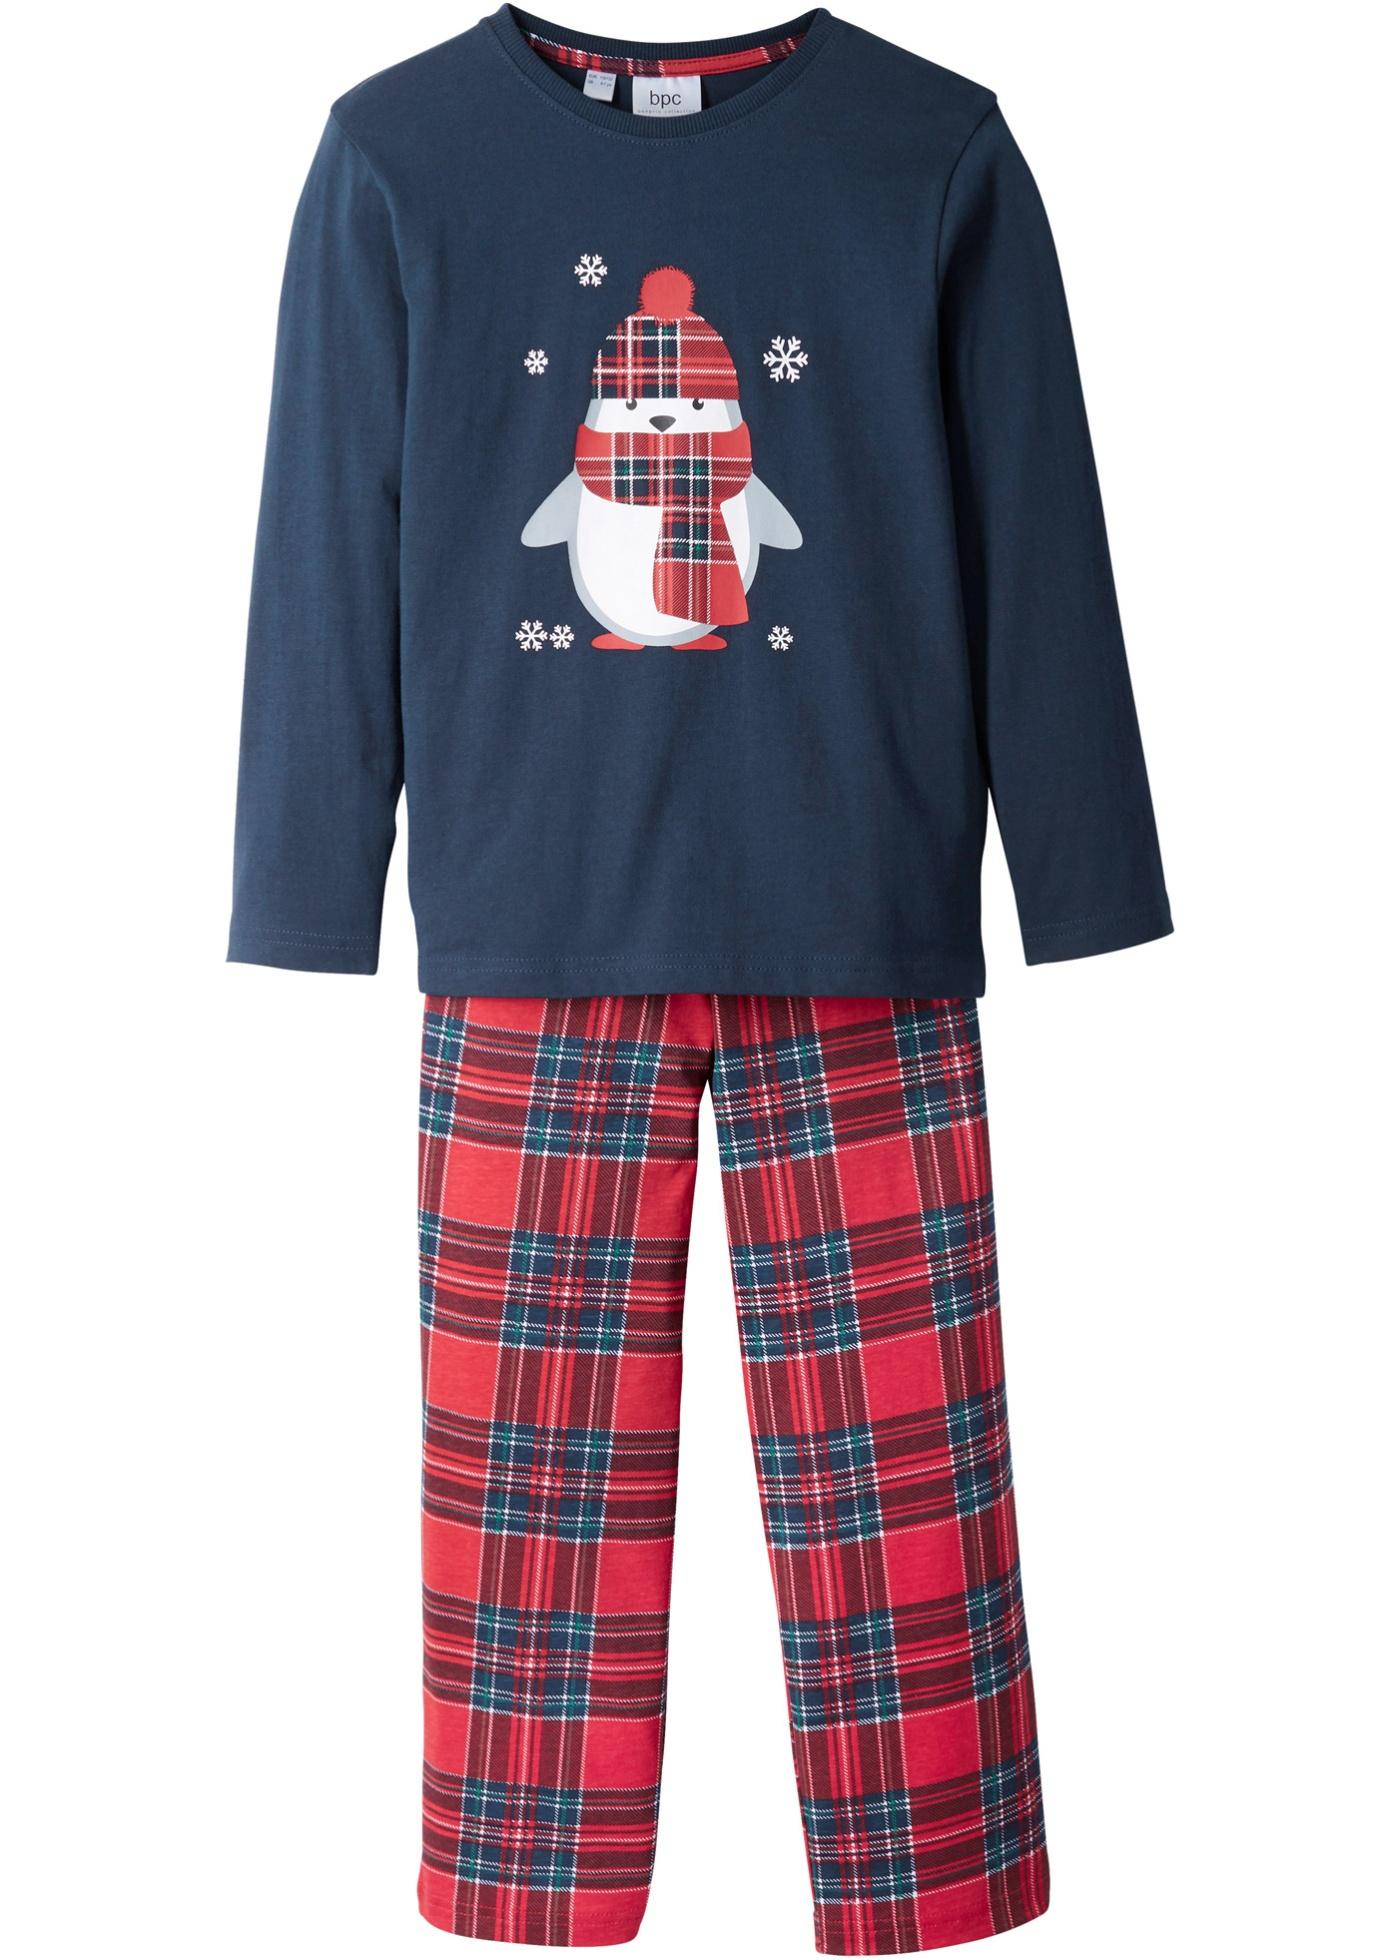 Pyjama enfant (Ens. 2 pces.)